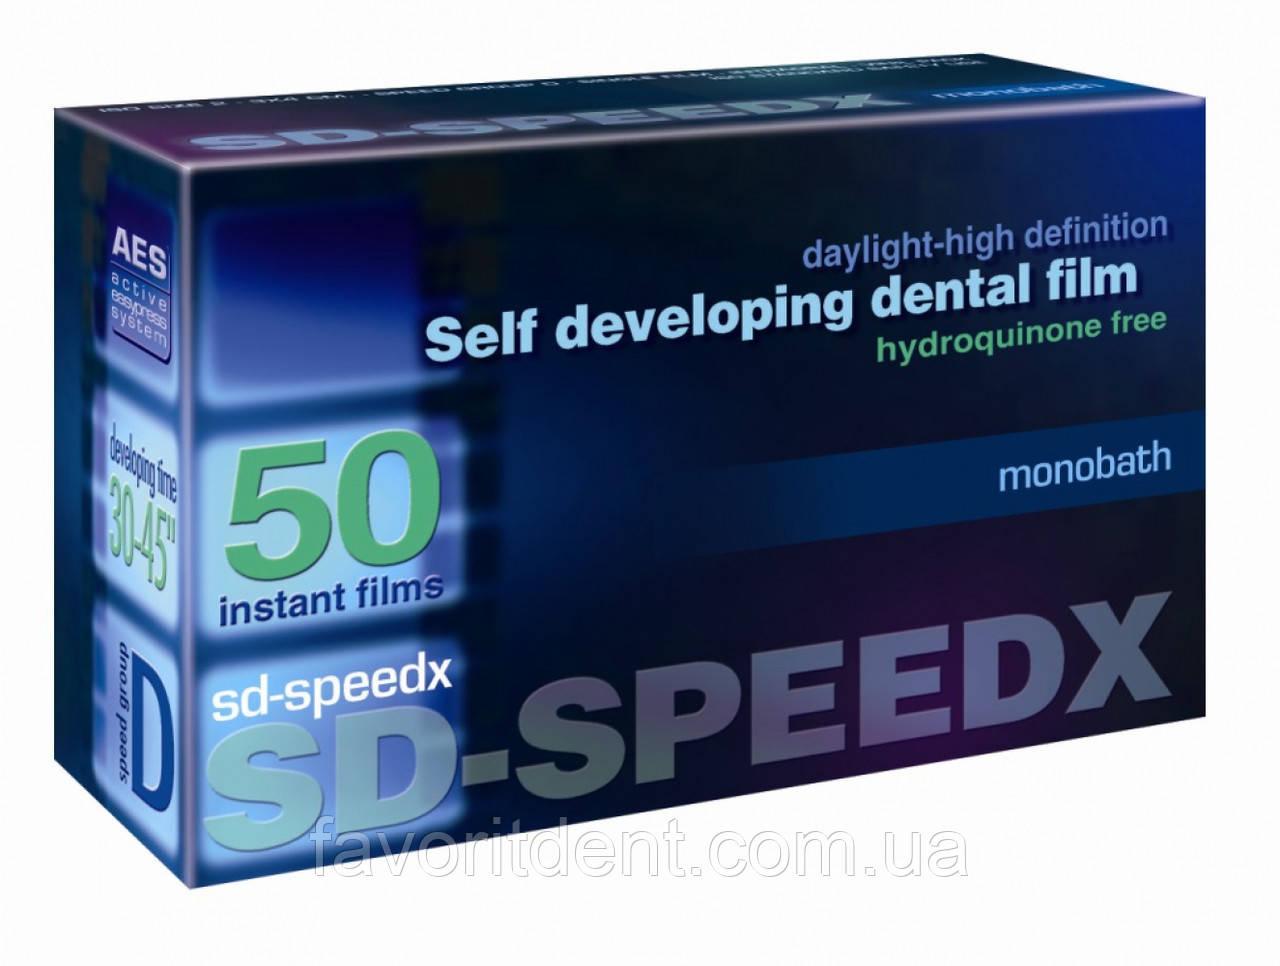 Самопроявляющаяся рентгенпленка SD-Speedx